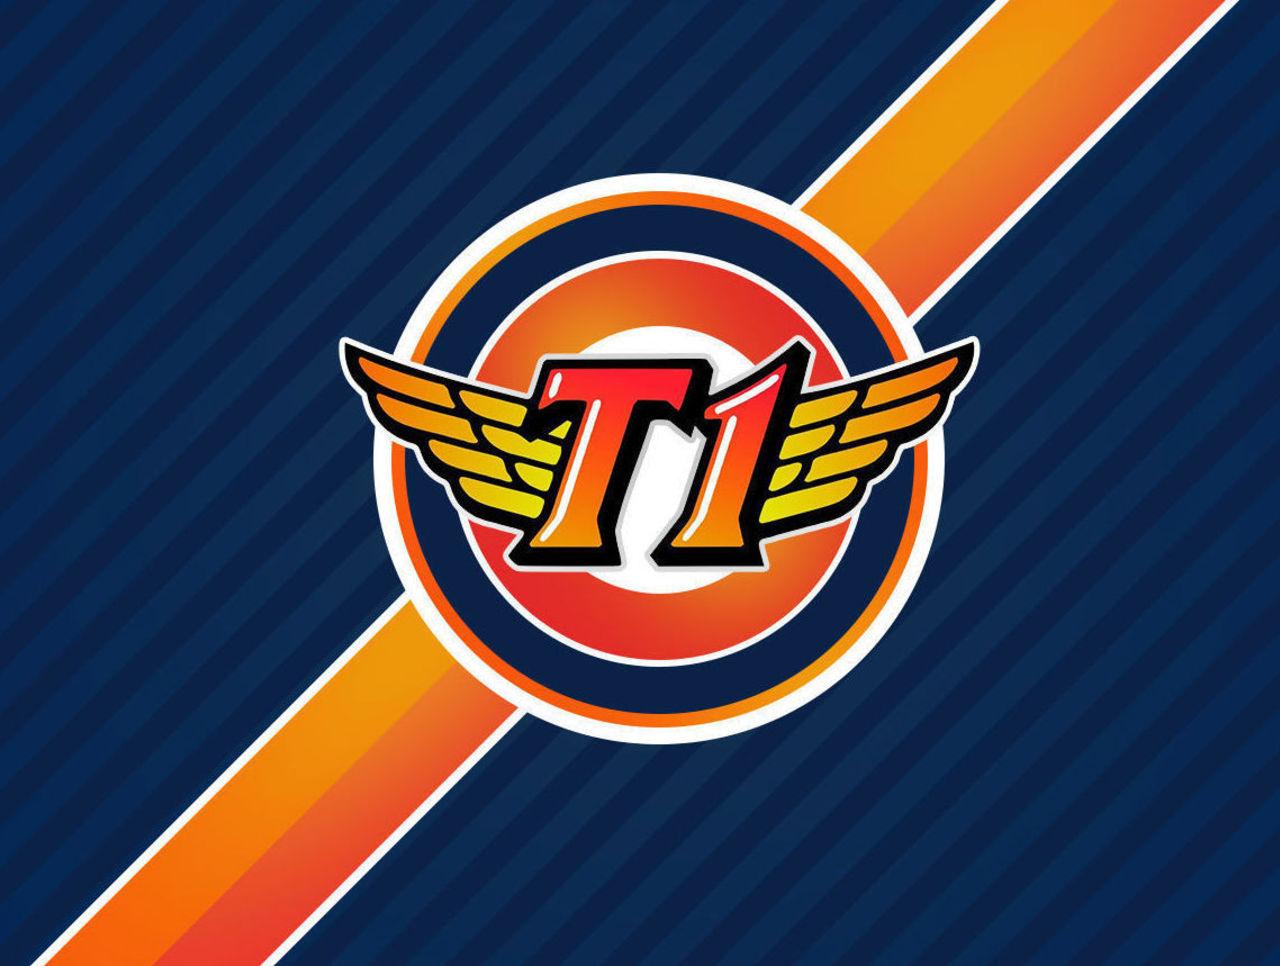 Call Of Duty Wallpaper Hd Sk Telecom T1 Sign Duke Thescore Esports